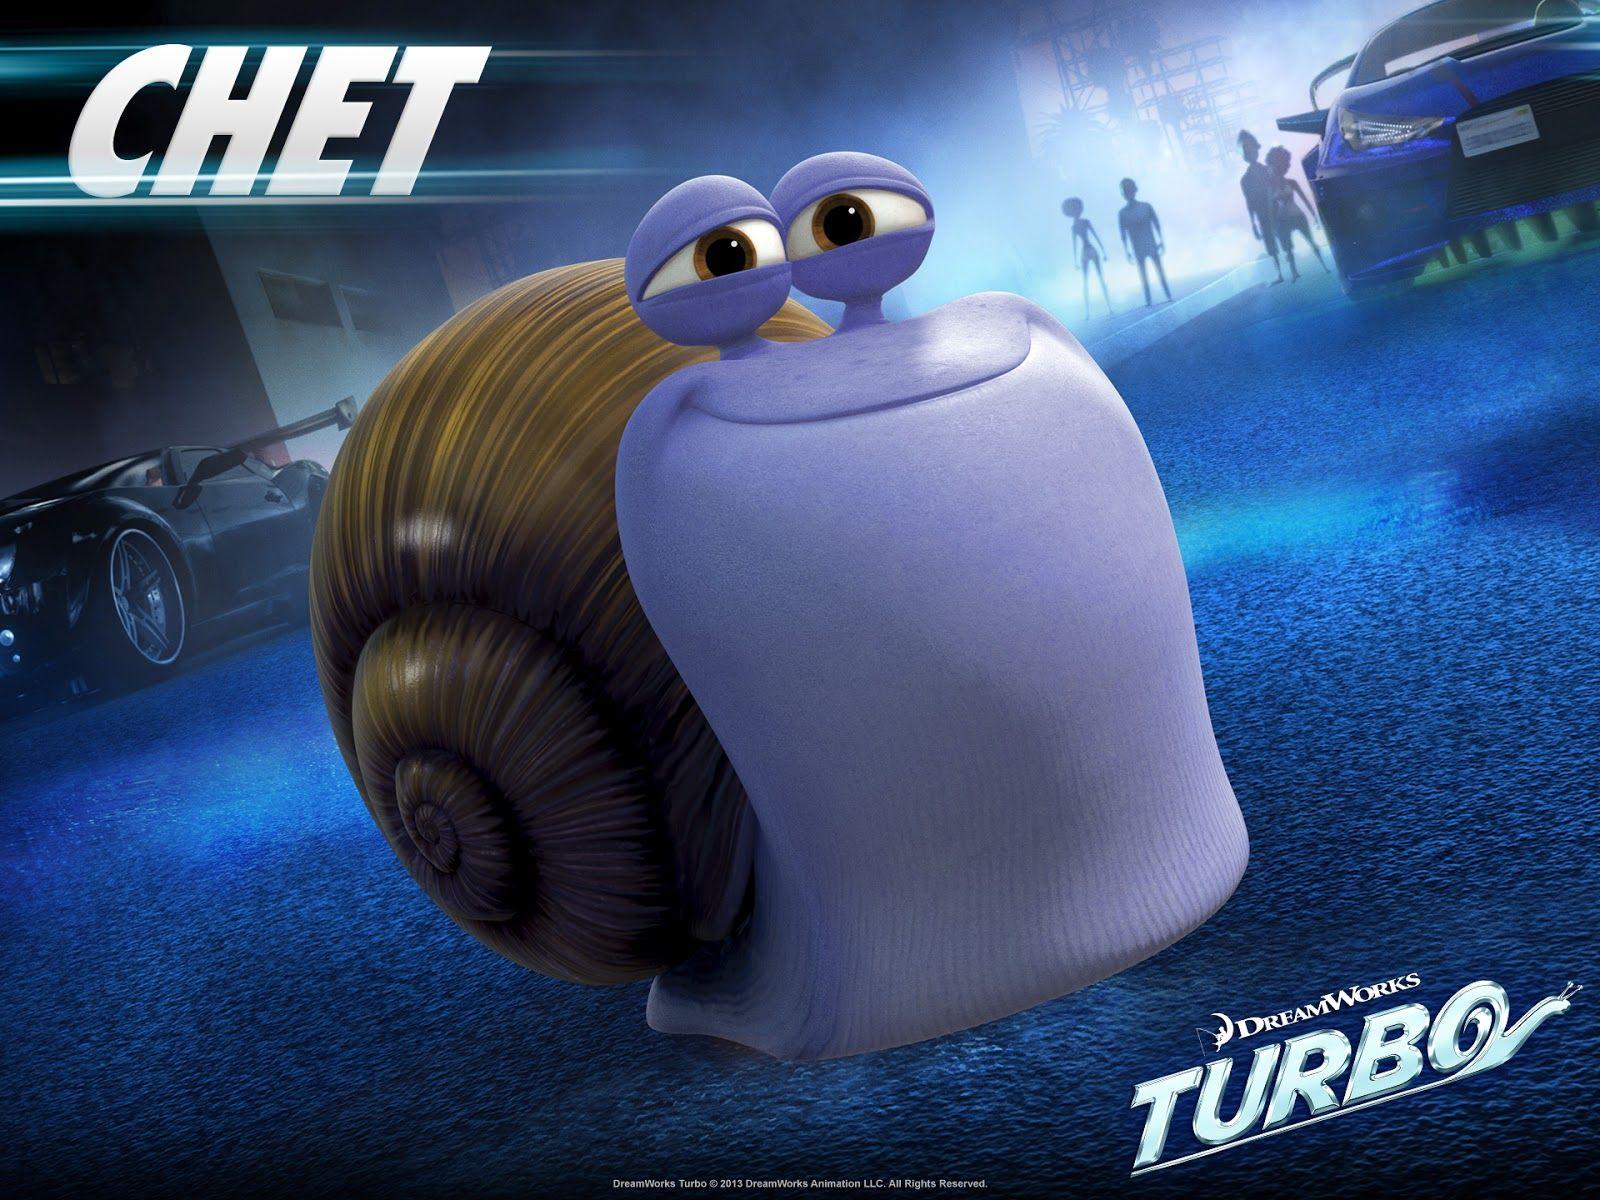 turbo chet - google search | ♥ dreamworks ♥ | pinterest | movie